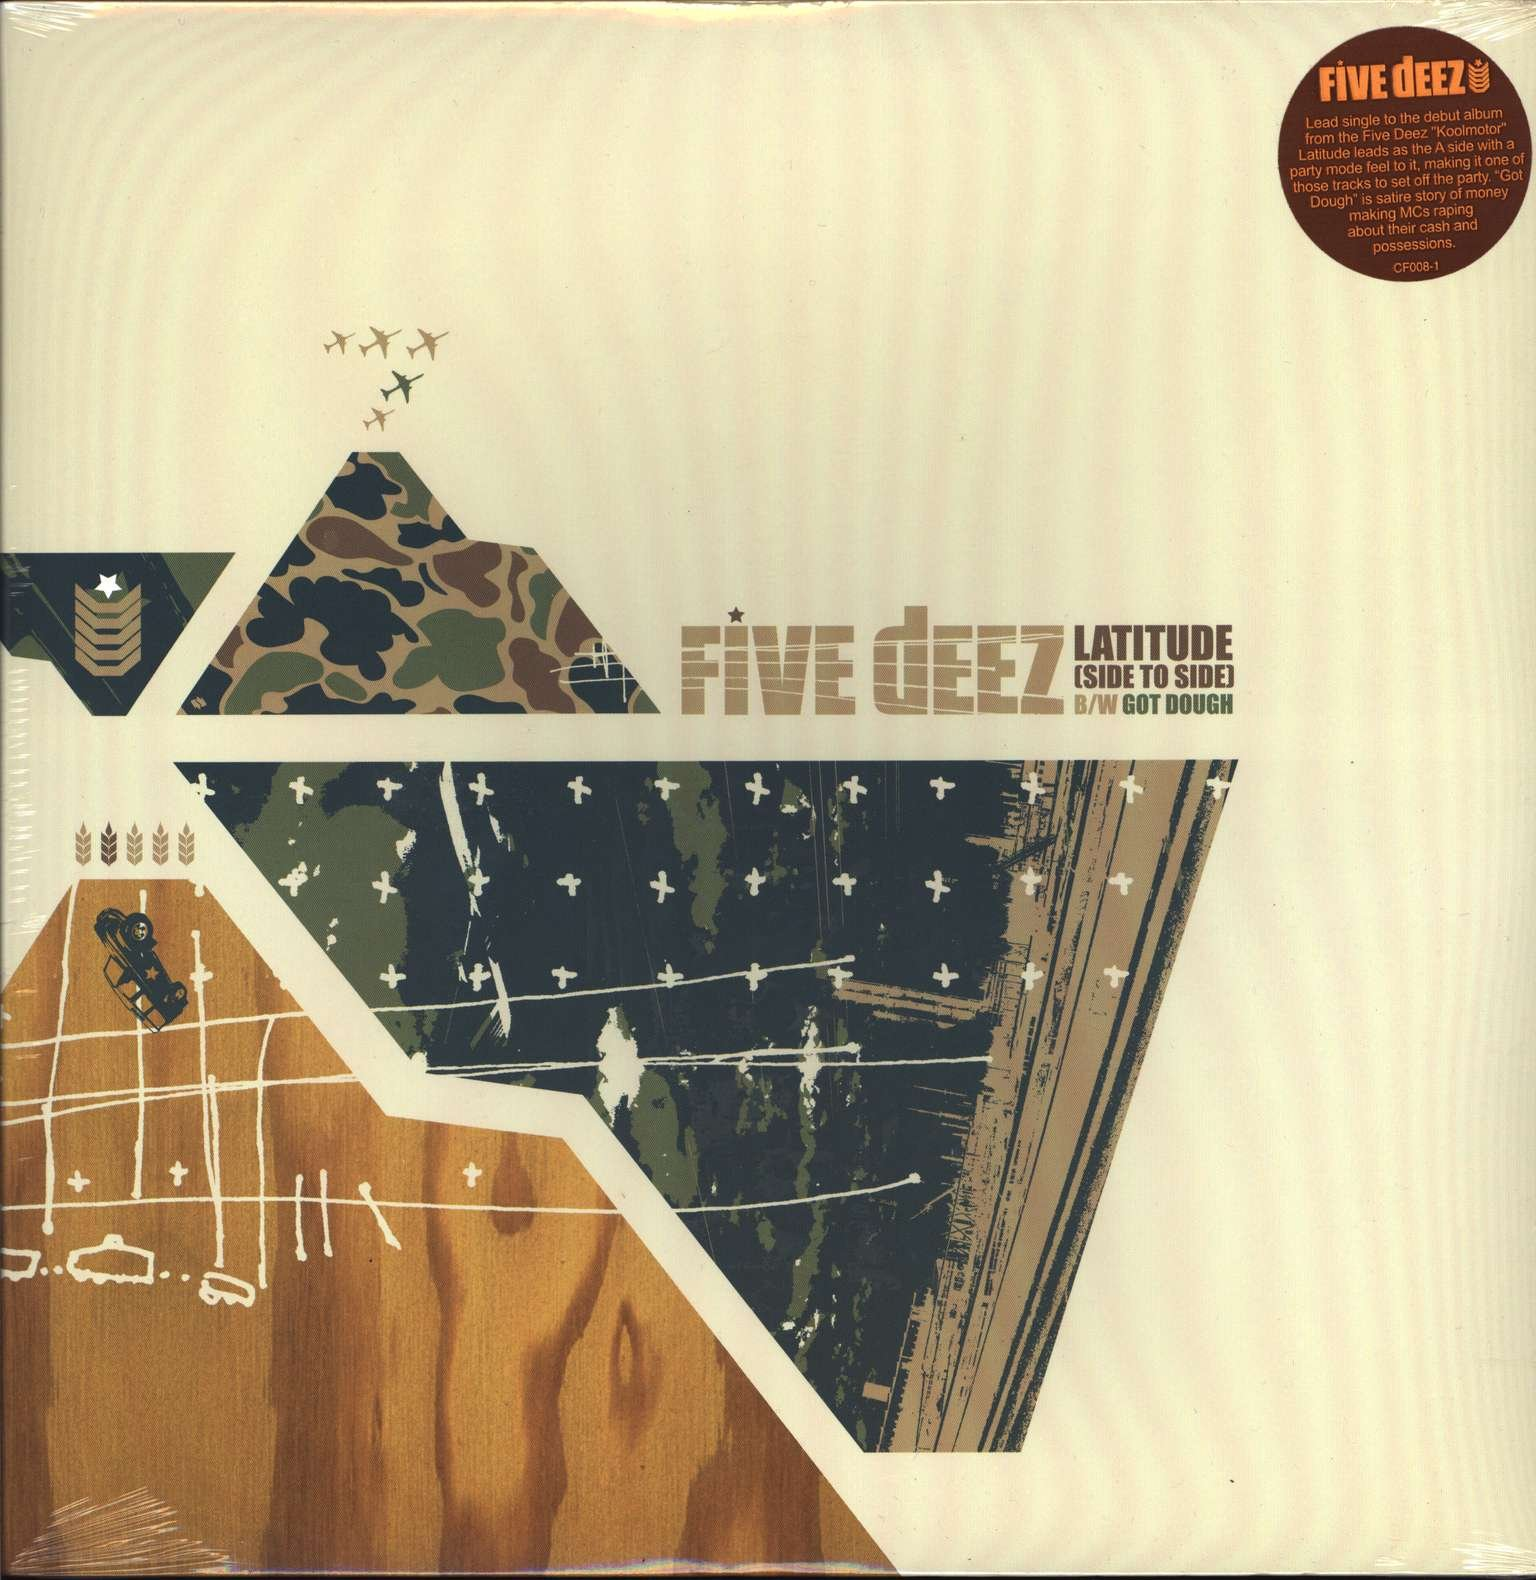 Five Deez - Latitude (Side To Side) B/W Got Dough (2001) [FLAC] Download